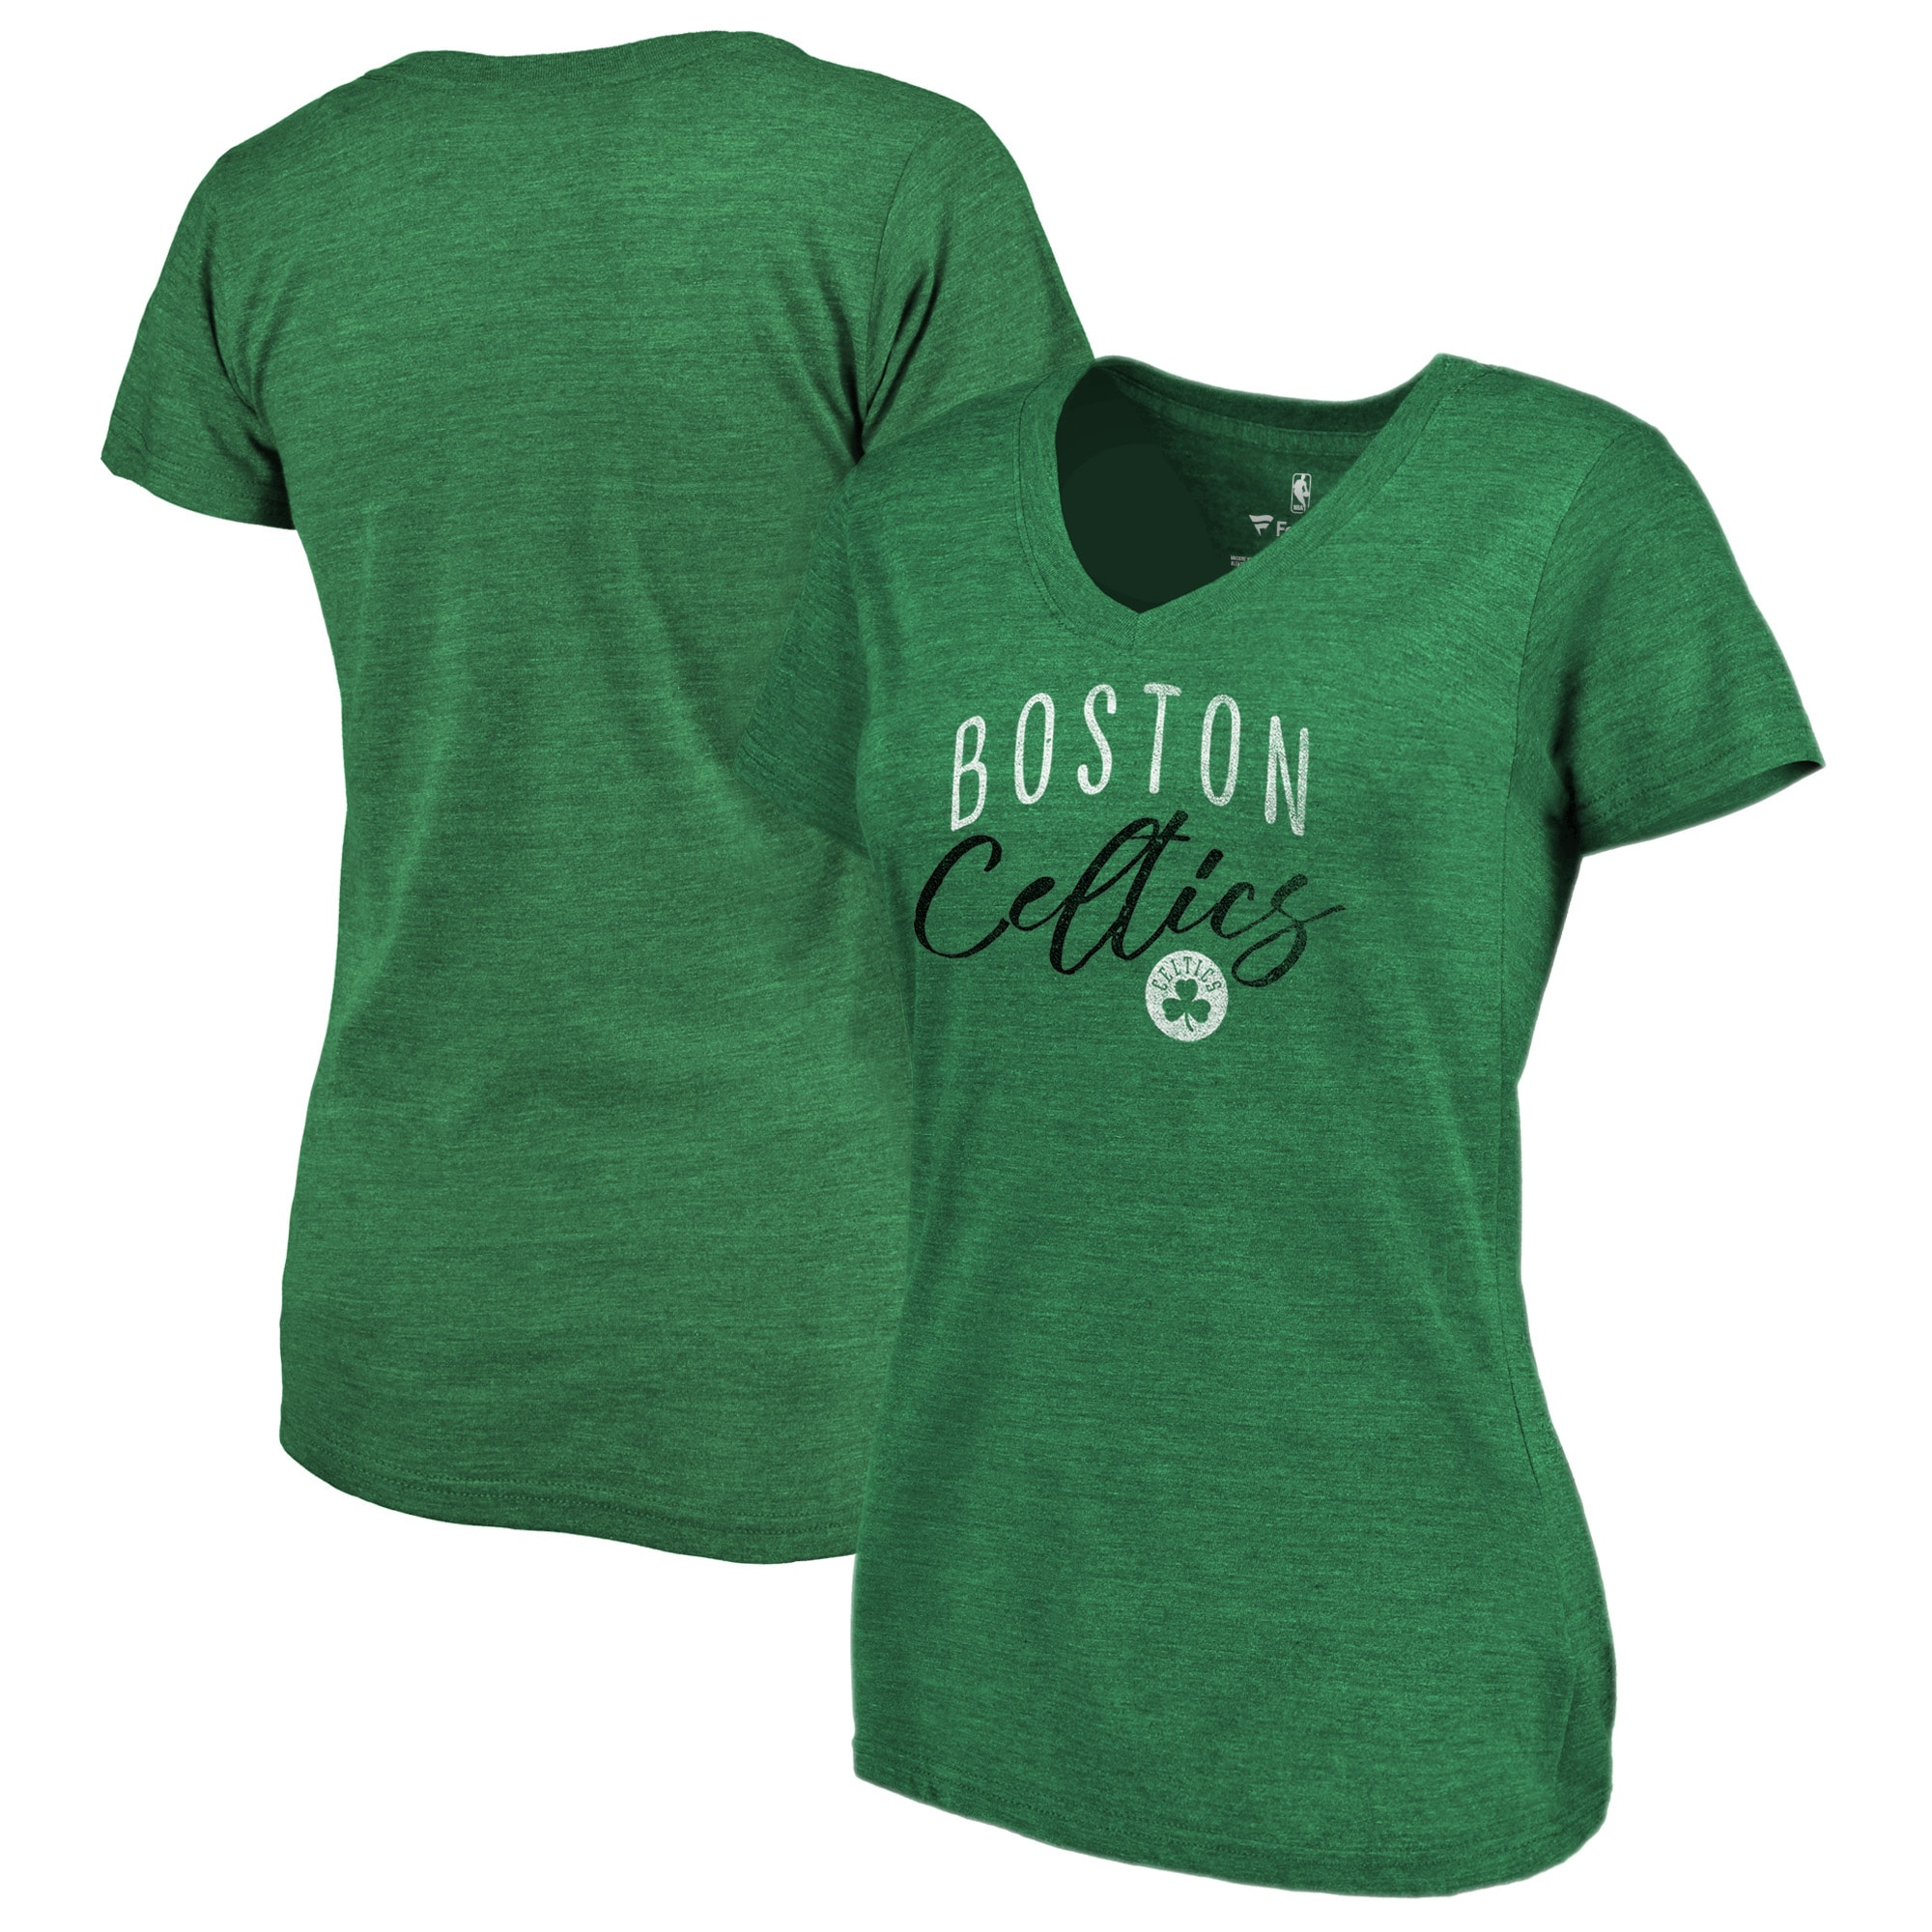 Boston Celtics Fanatics Branded Women's Graceful Tri-Blend T-Shirt - Heathered Green